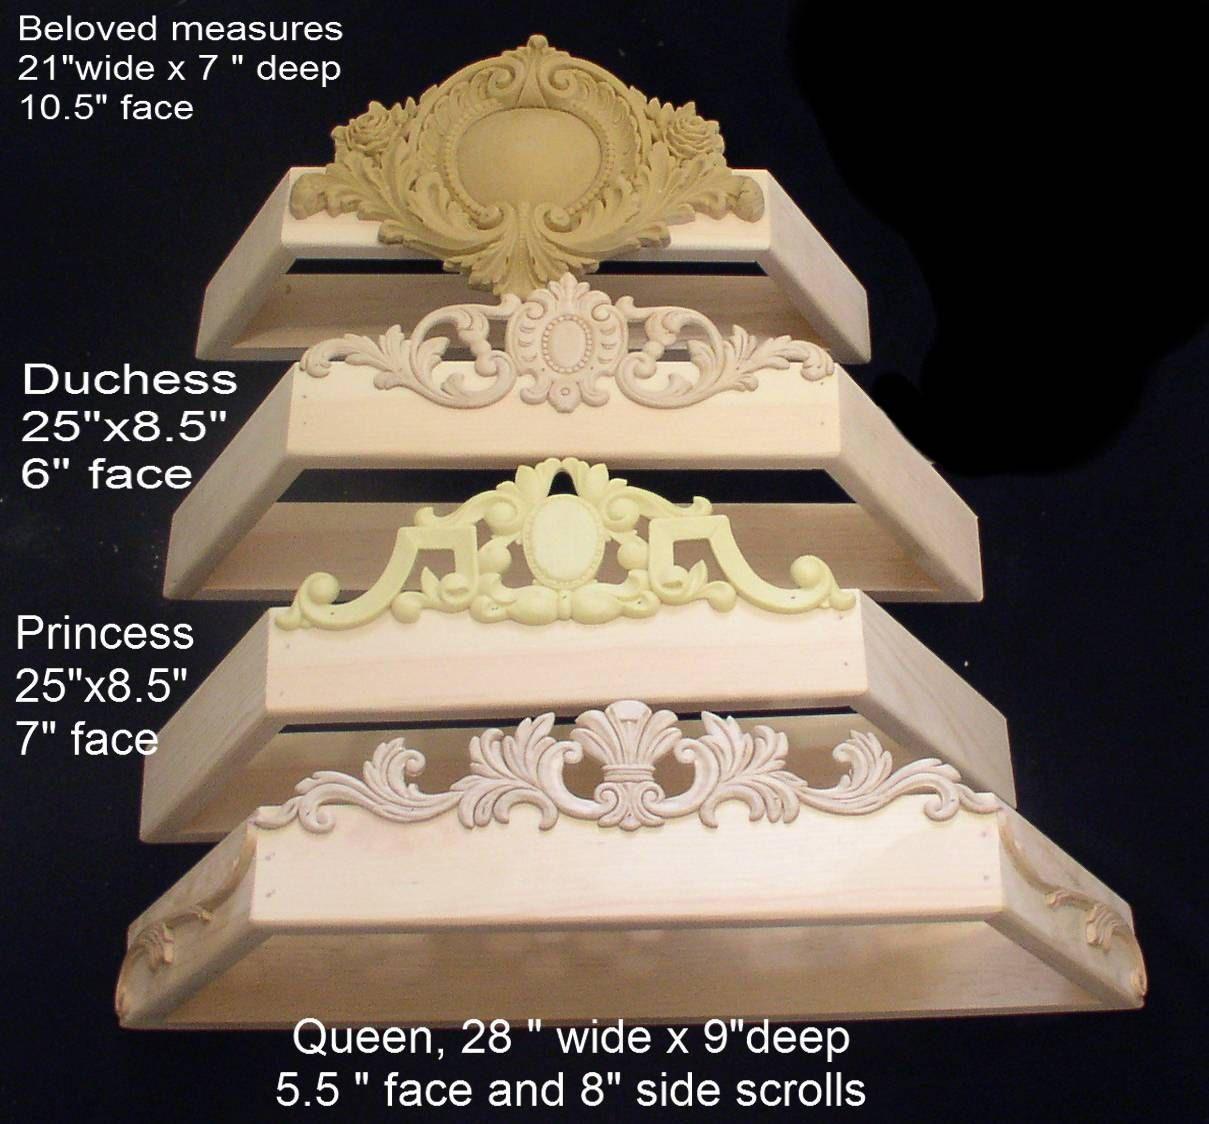 Bed Crown Canopy Crib Crown Nursery Design Wall Decor: Bed Crown, Bed Crown Canopy, Diy Canopy